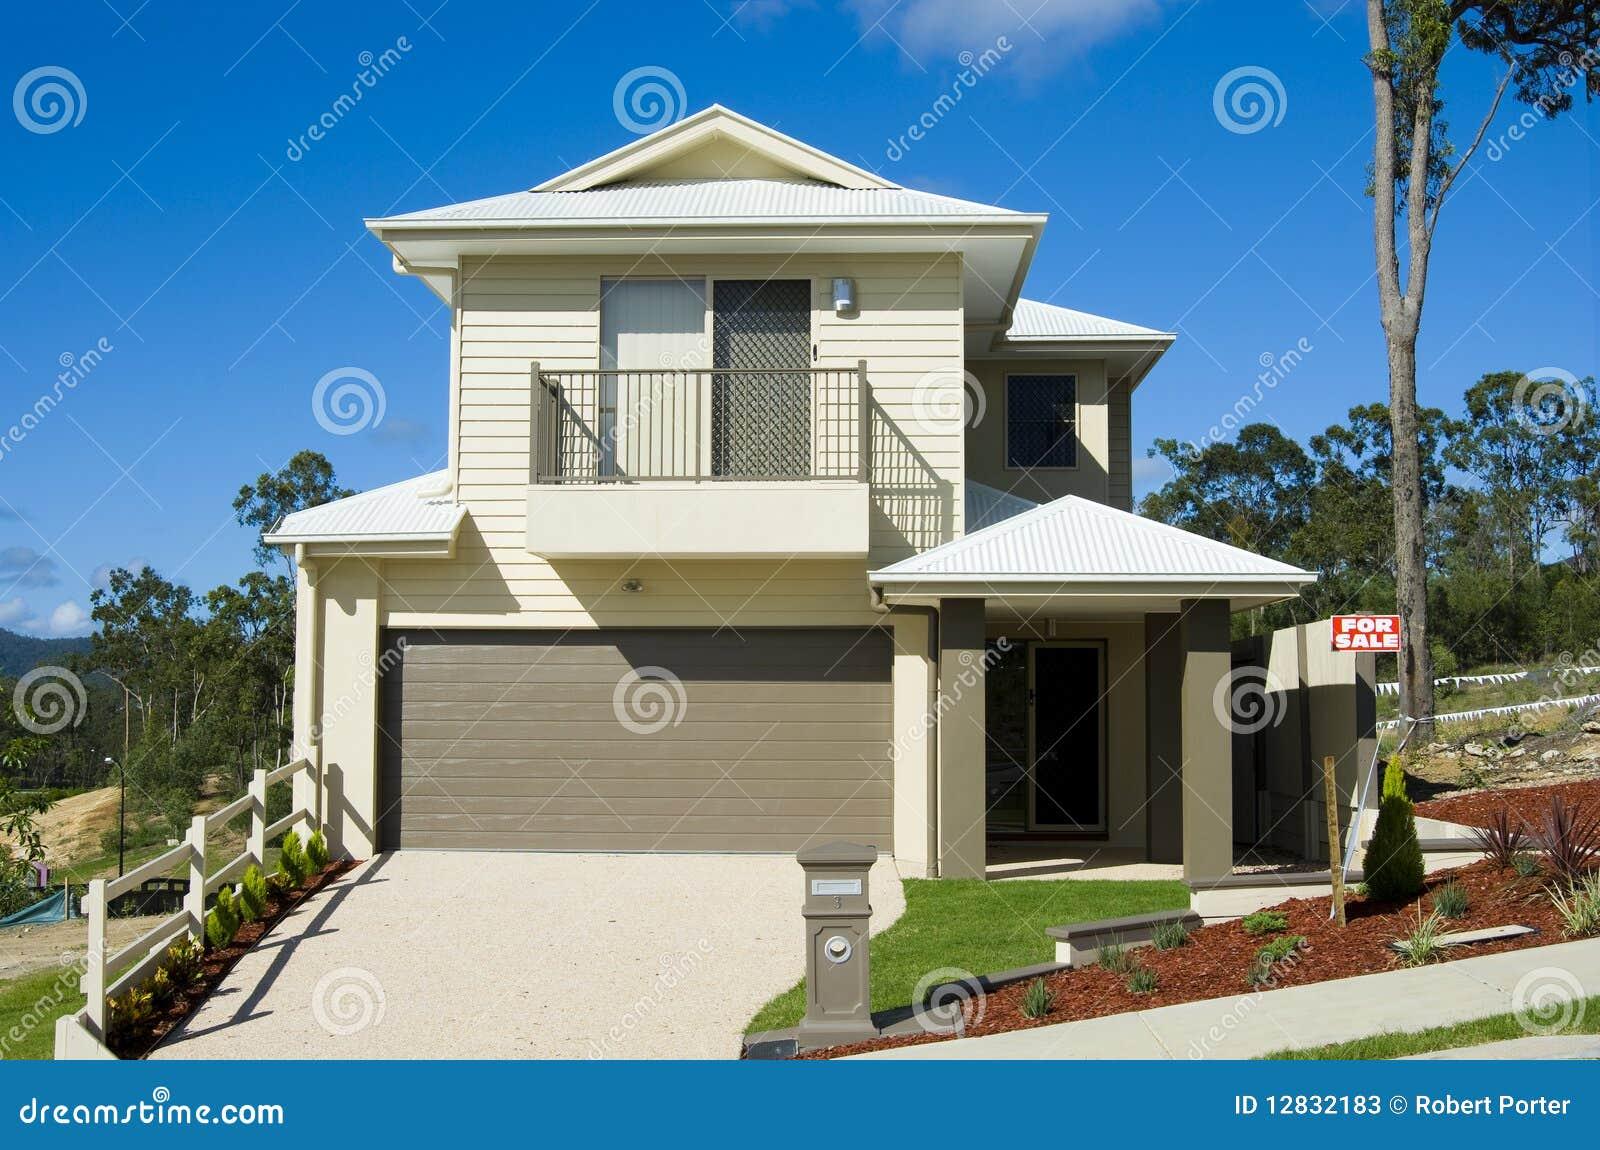 venta casa moderna: